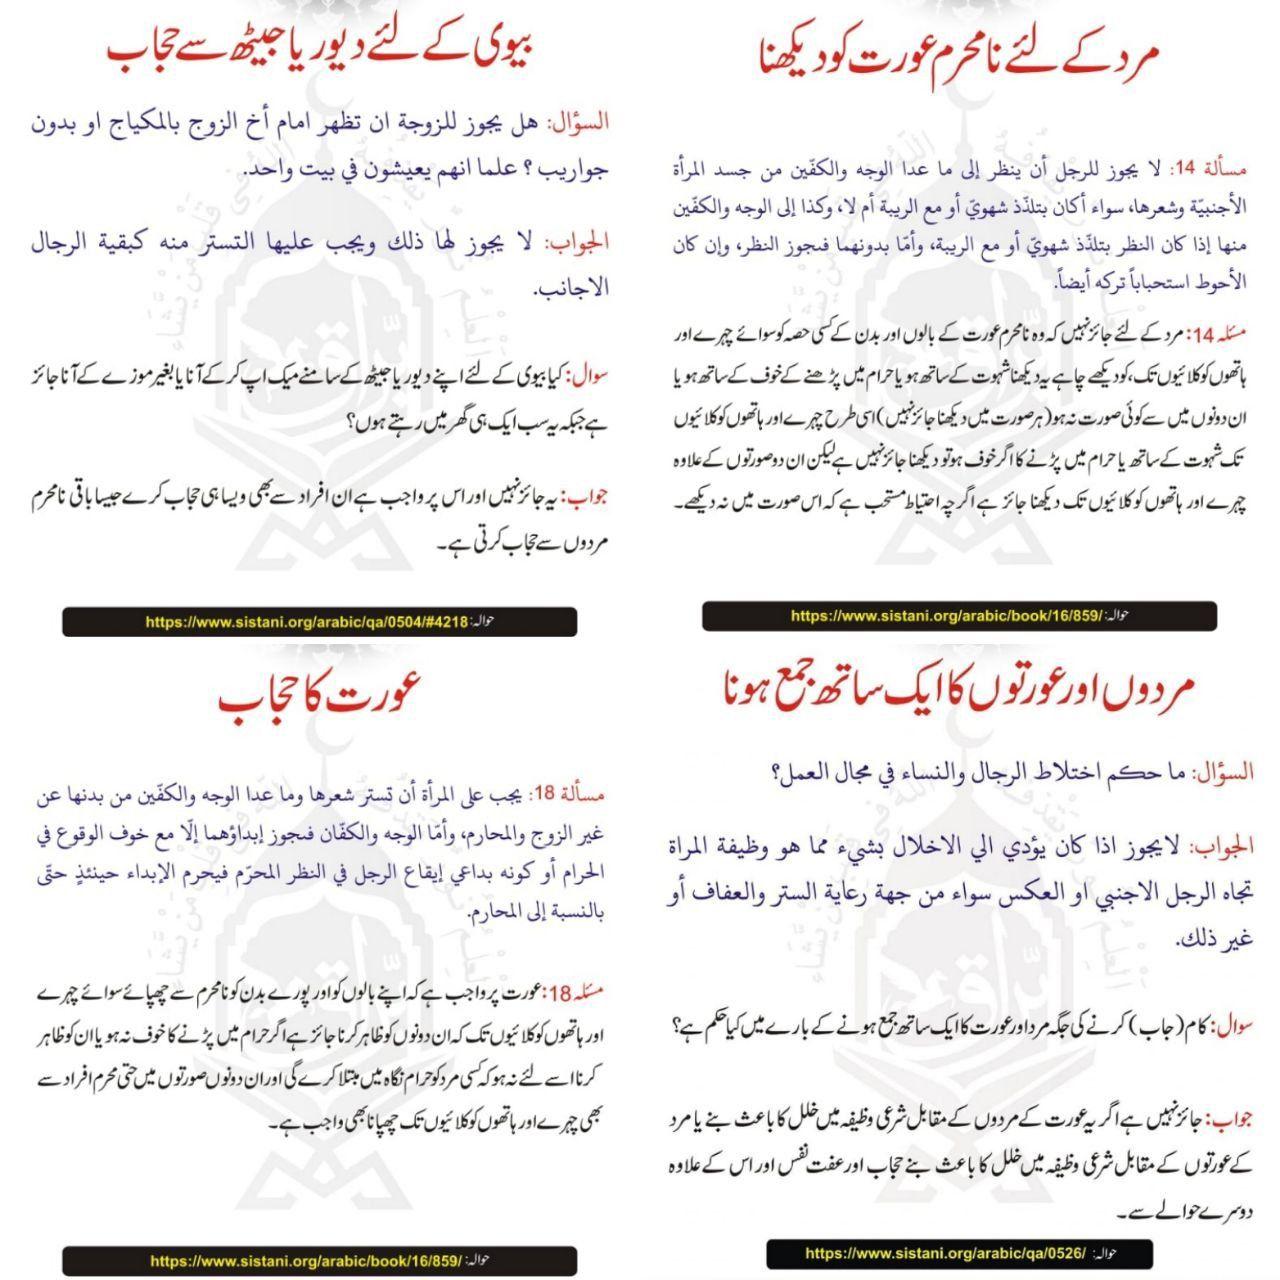 Pin By Shella Lounge On Quran Khawani Group Posts Bullet Journal Journal Post